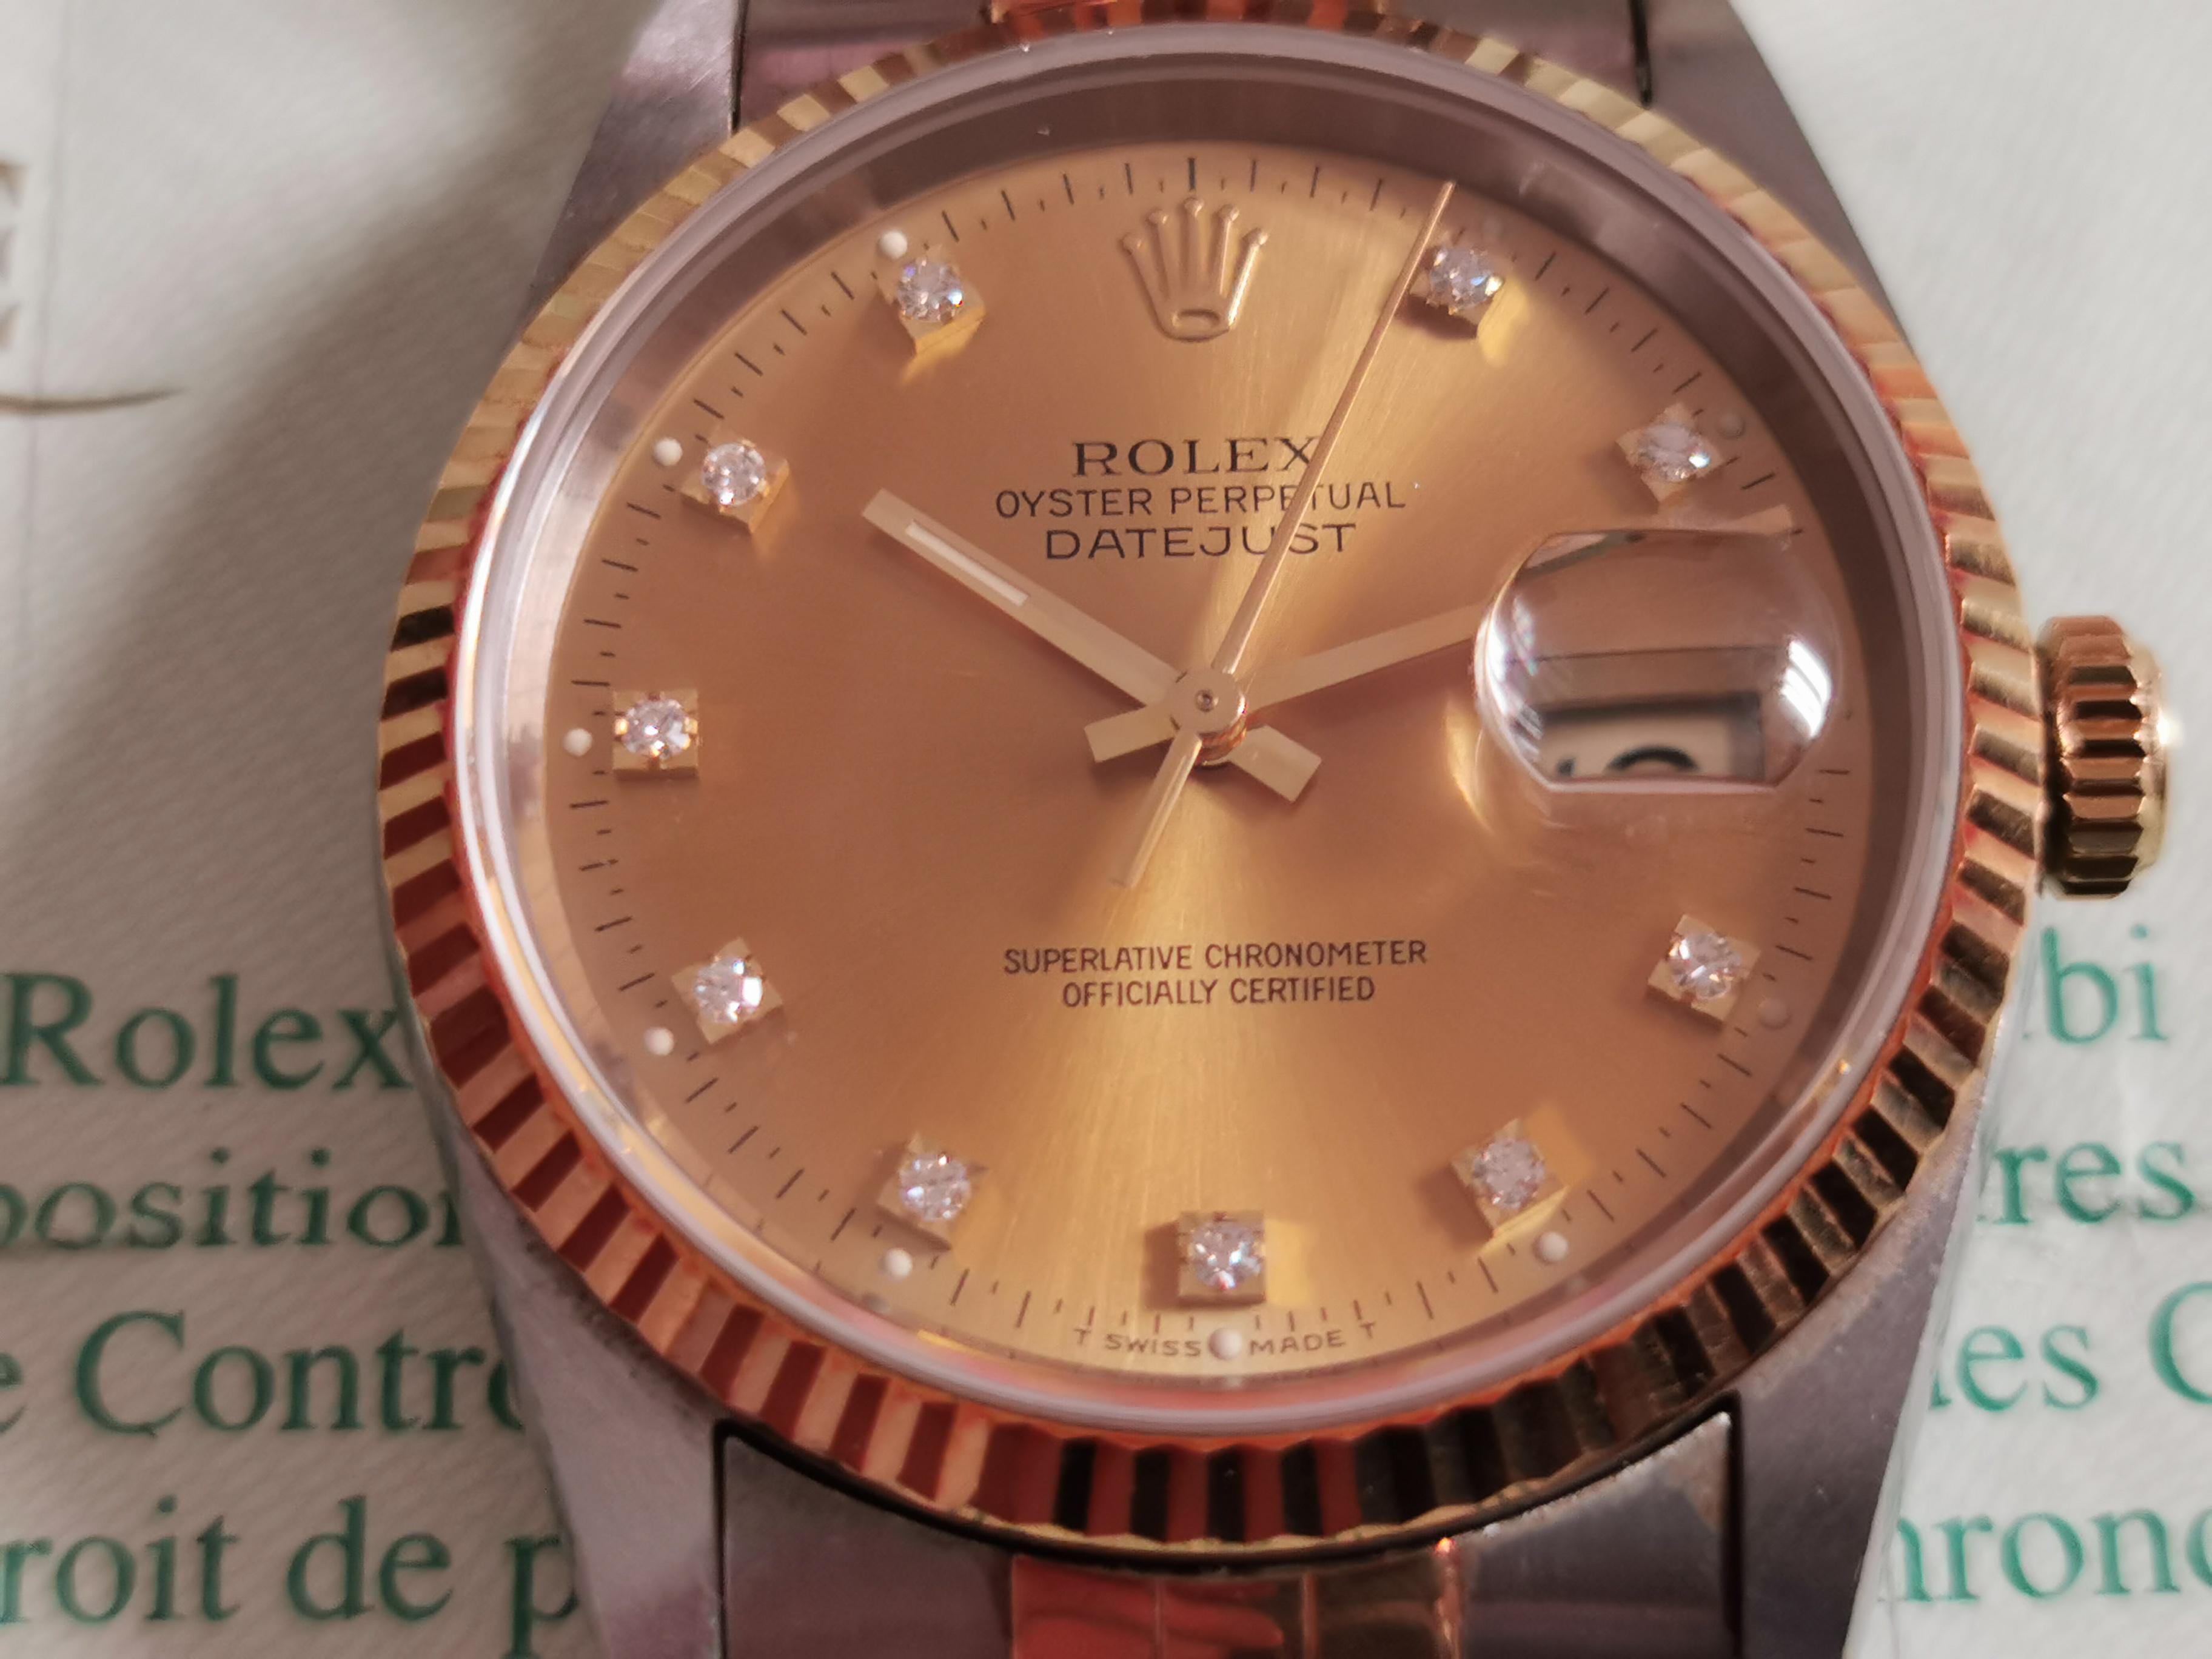 Rolex Datejust Datejust 18 Kt Gold/Steel 16233 Champagne Diamond Dial jubilee - warranty 1994 | San Giorgio a Cremano